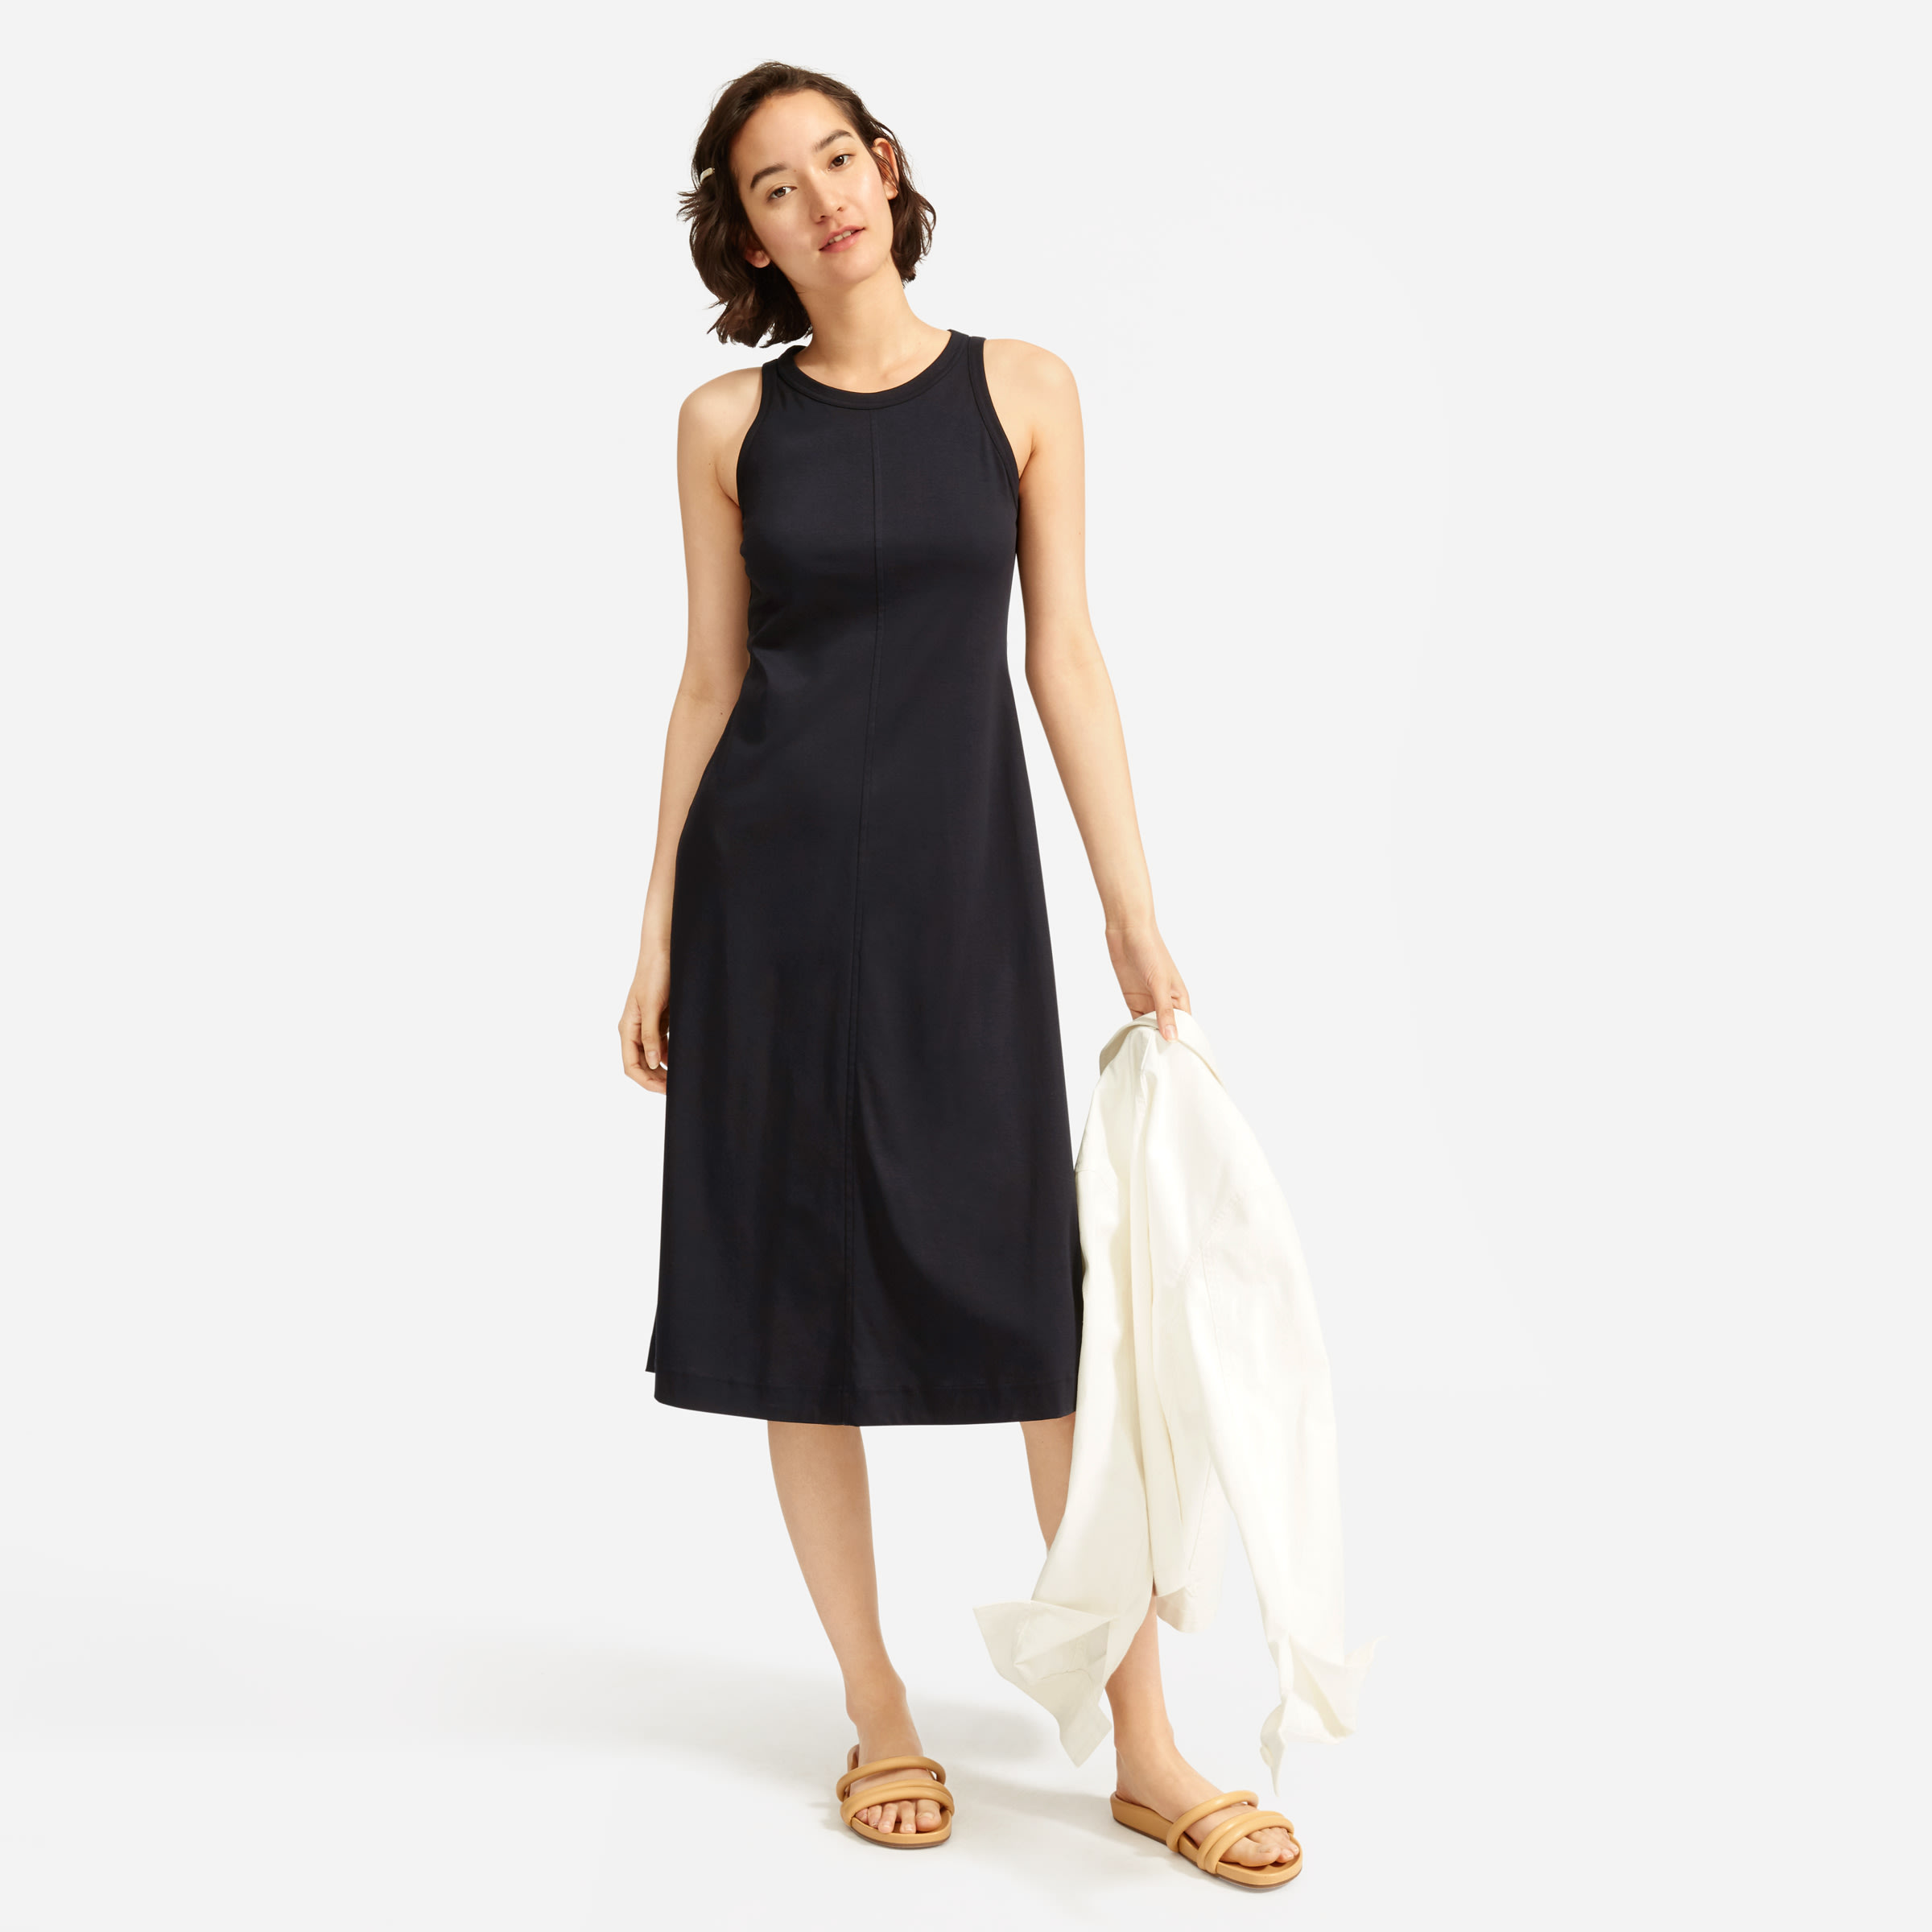 9ed6bd4e789f38 Women's Dresses & Jumpsuits – Tank, Tee, Cami Dresses & More | Everlane